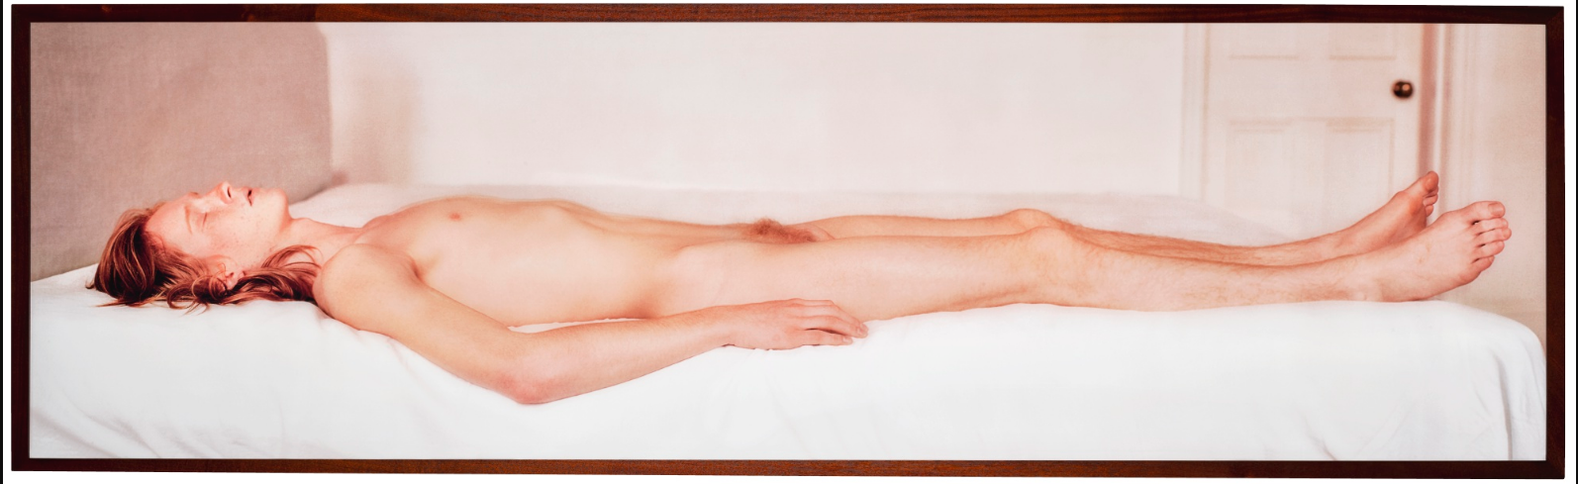 Sam Taylor-Johnson-Sleep-2002